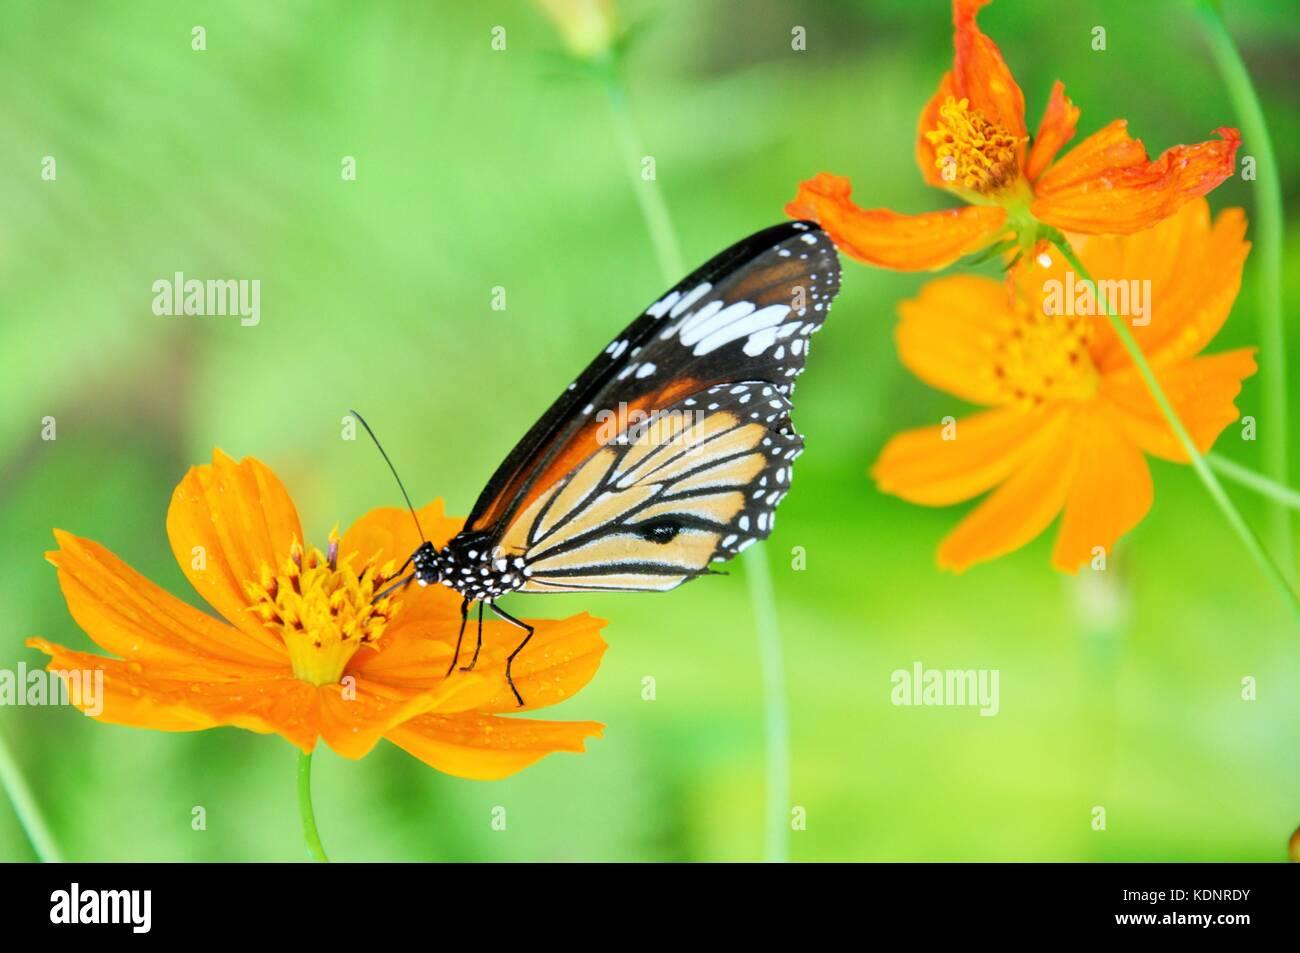 Hermosas Mariposas Alimentándose De Bonitas Flores De Color Naranja